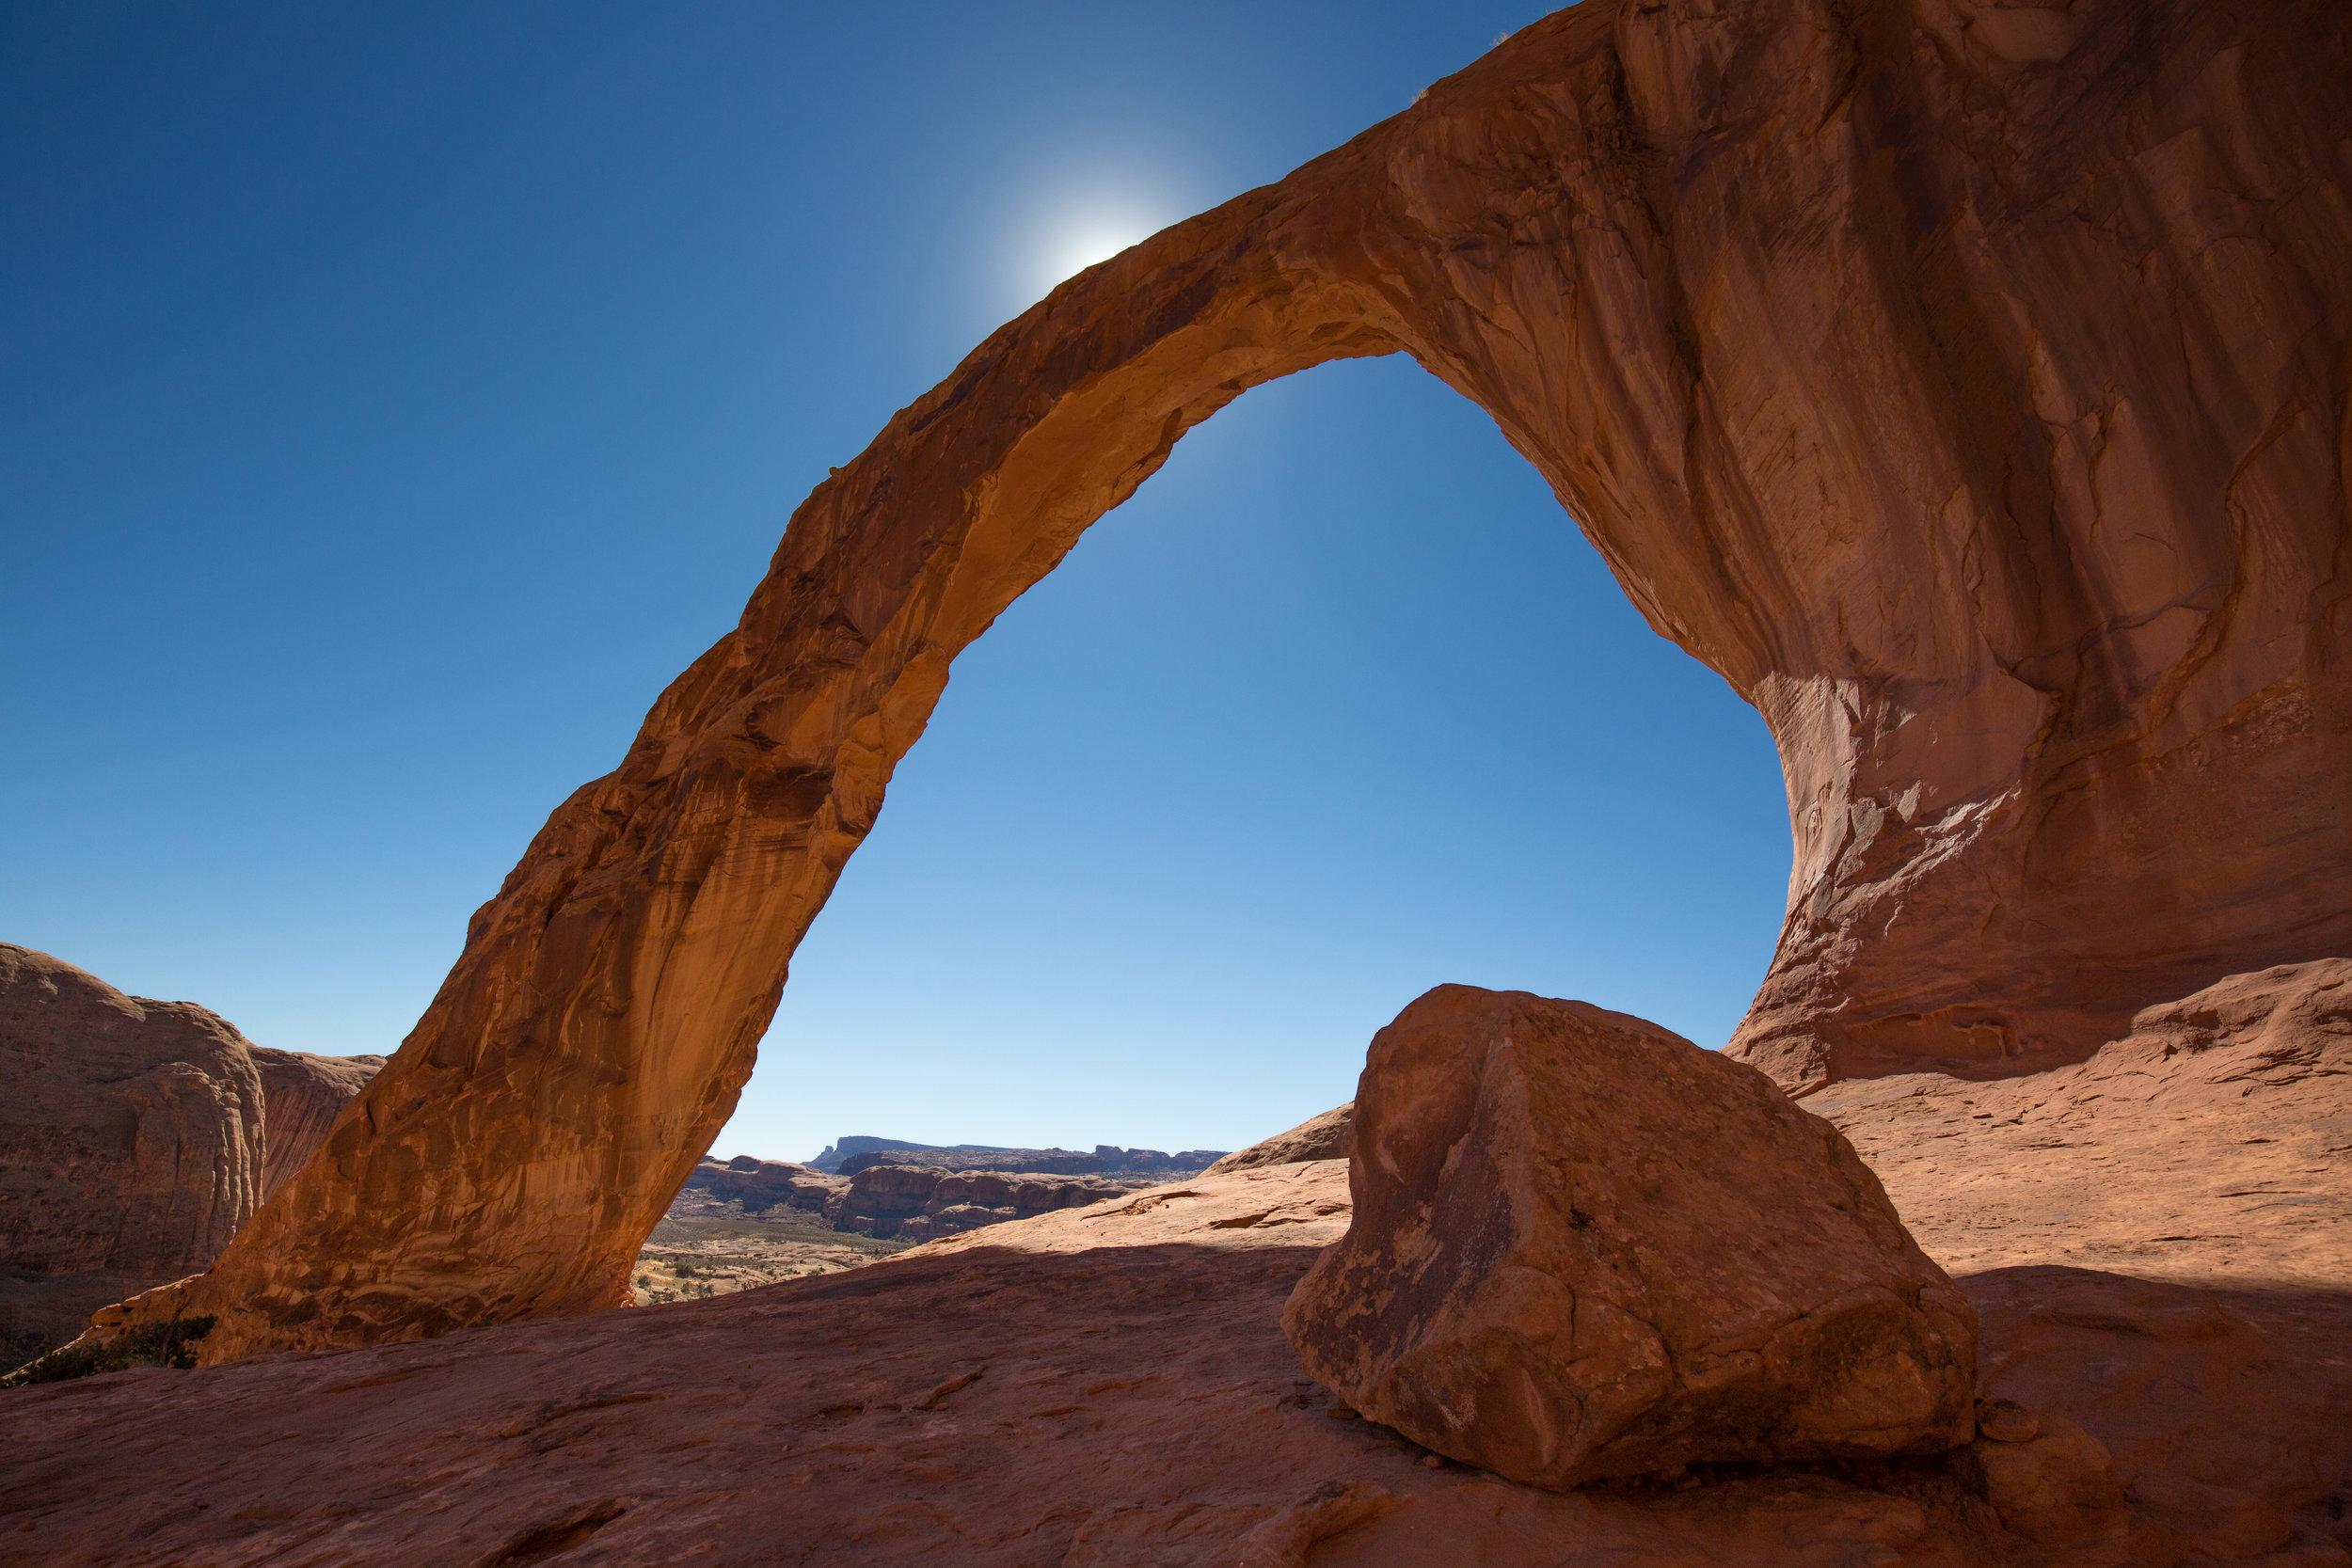 Red Rock, Arches, Corona Arch, Hike Utah, Travel Guide, Corona, Sunshine, Define Fettle